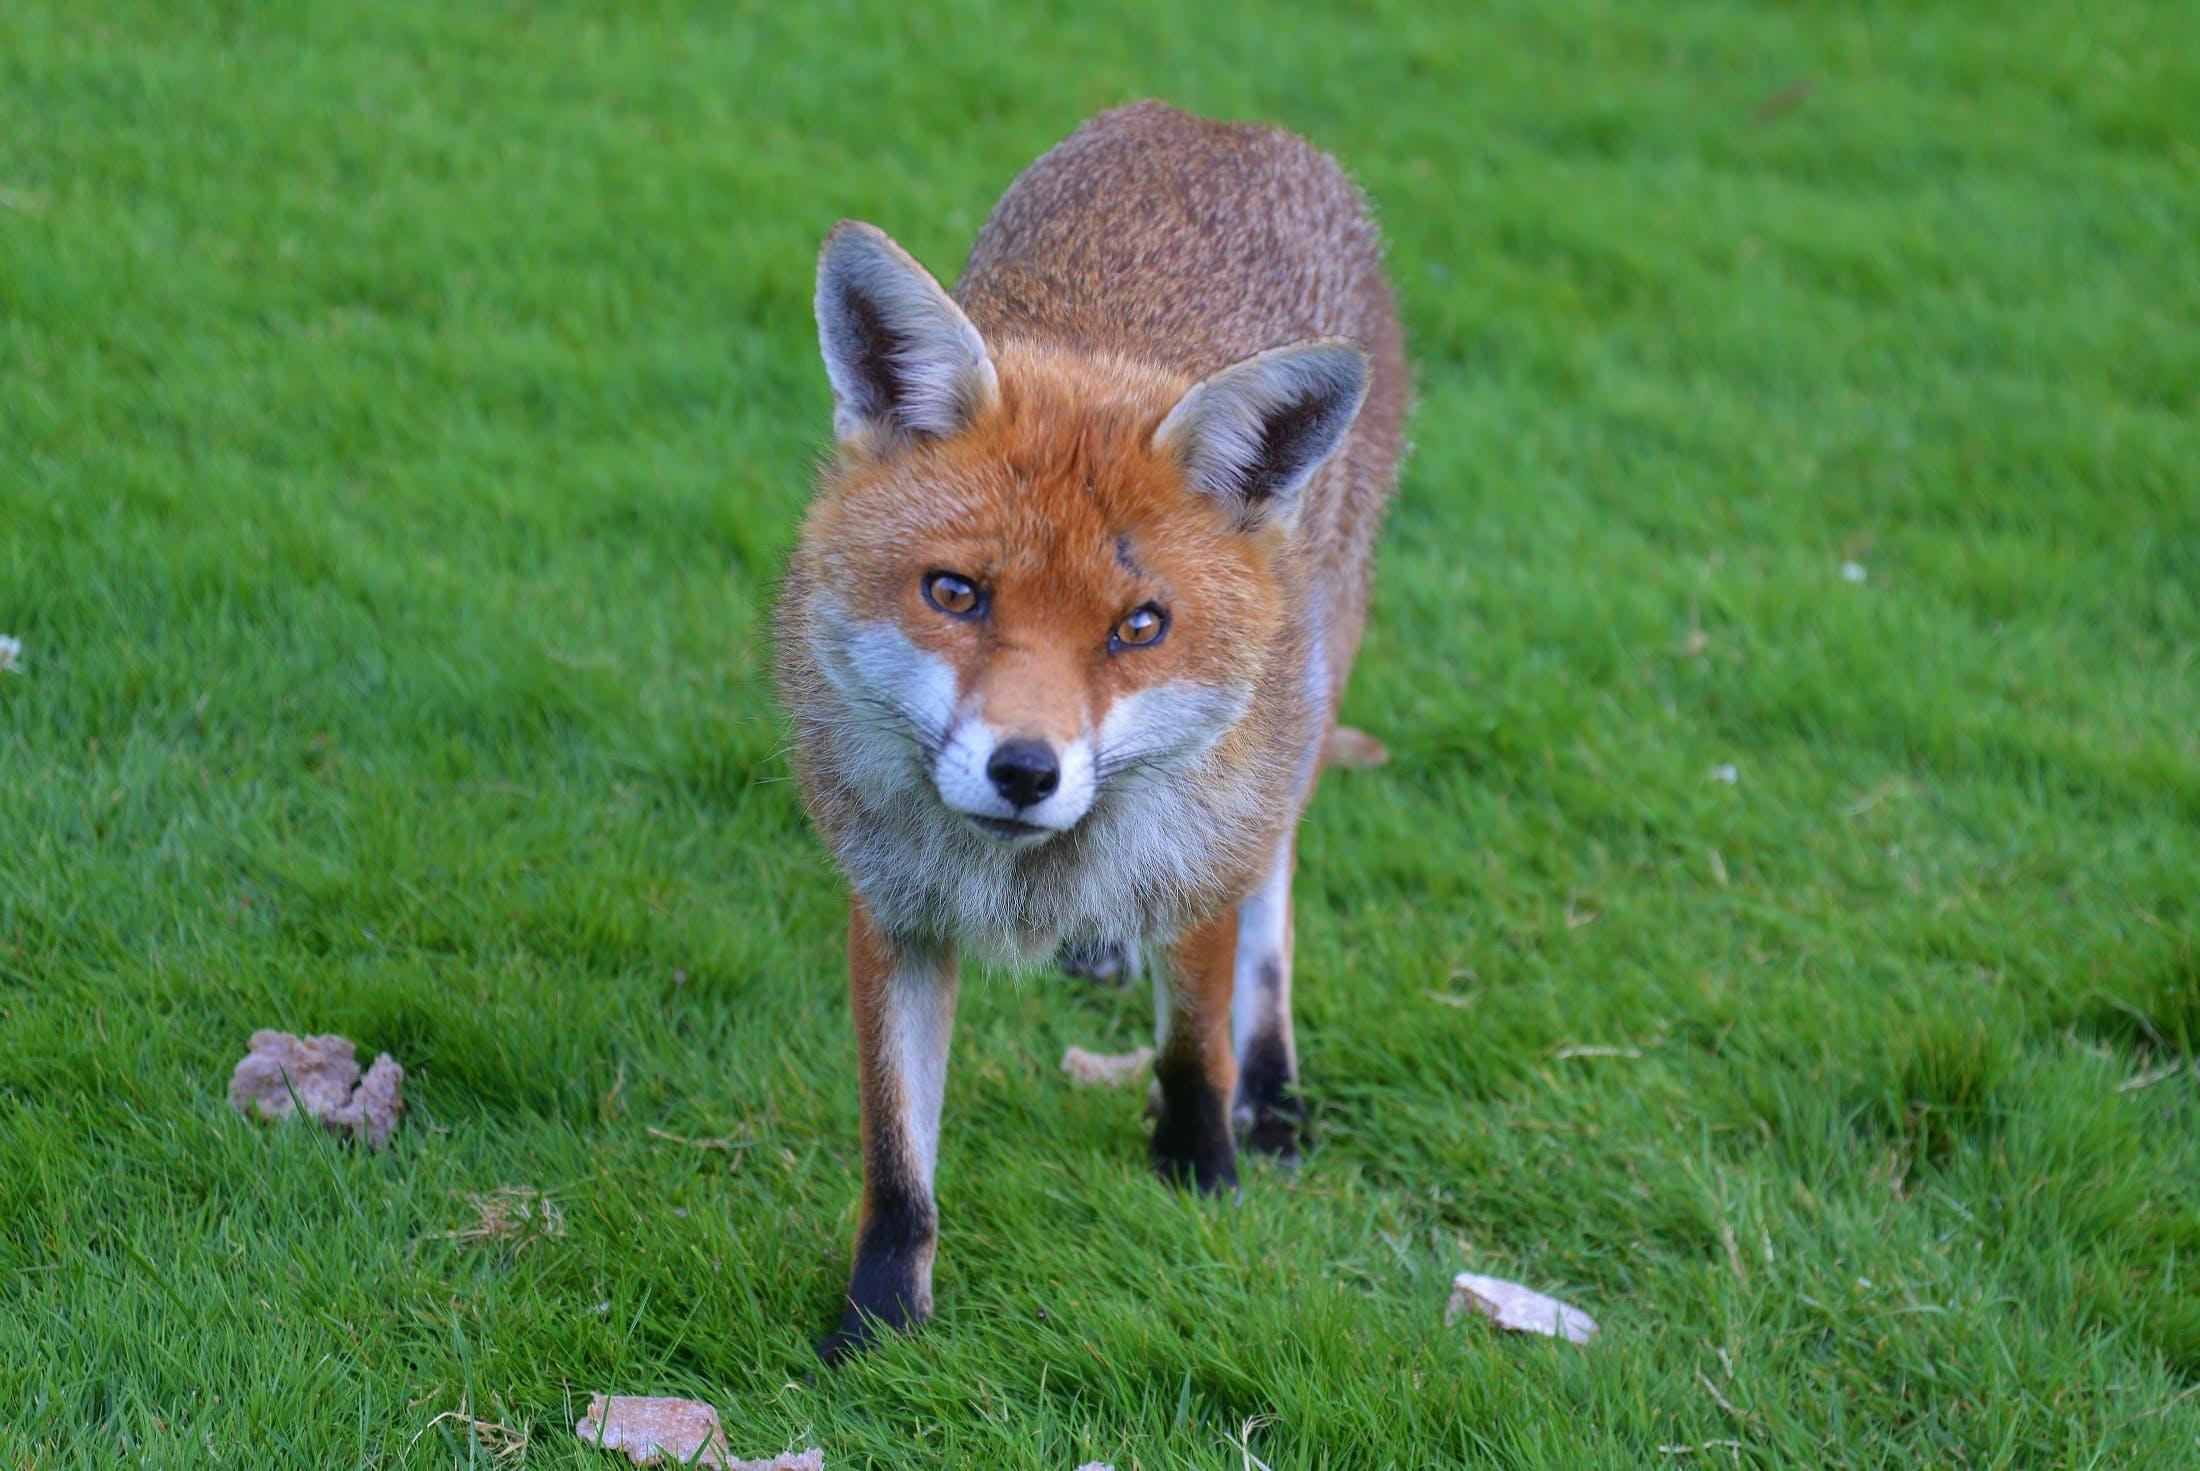 Brown Fox in Green Grass Field